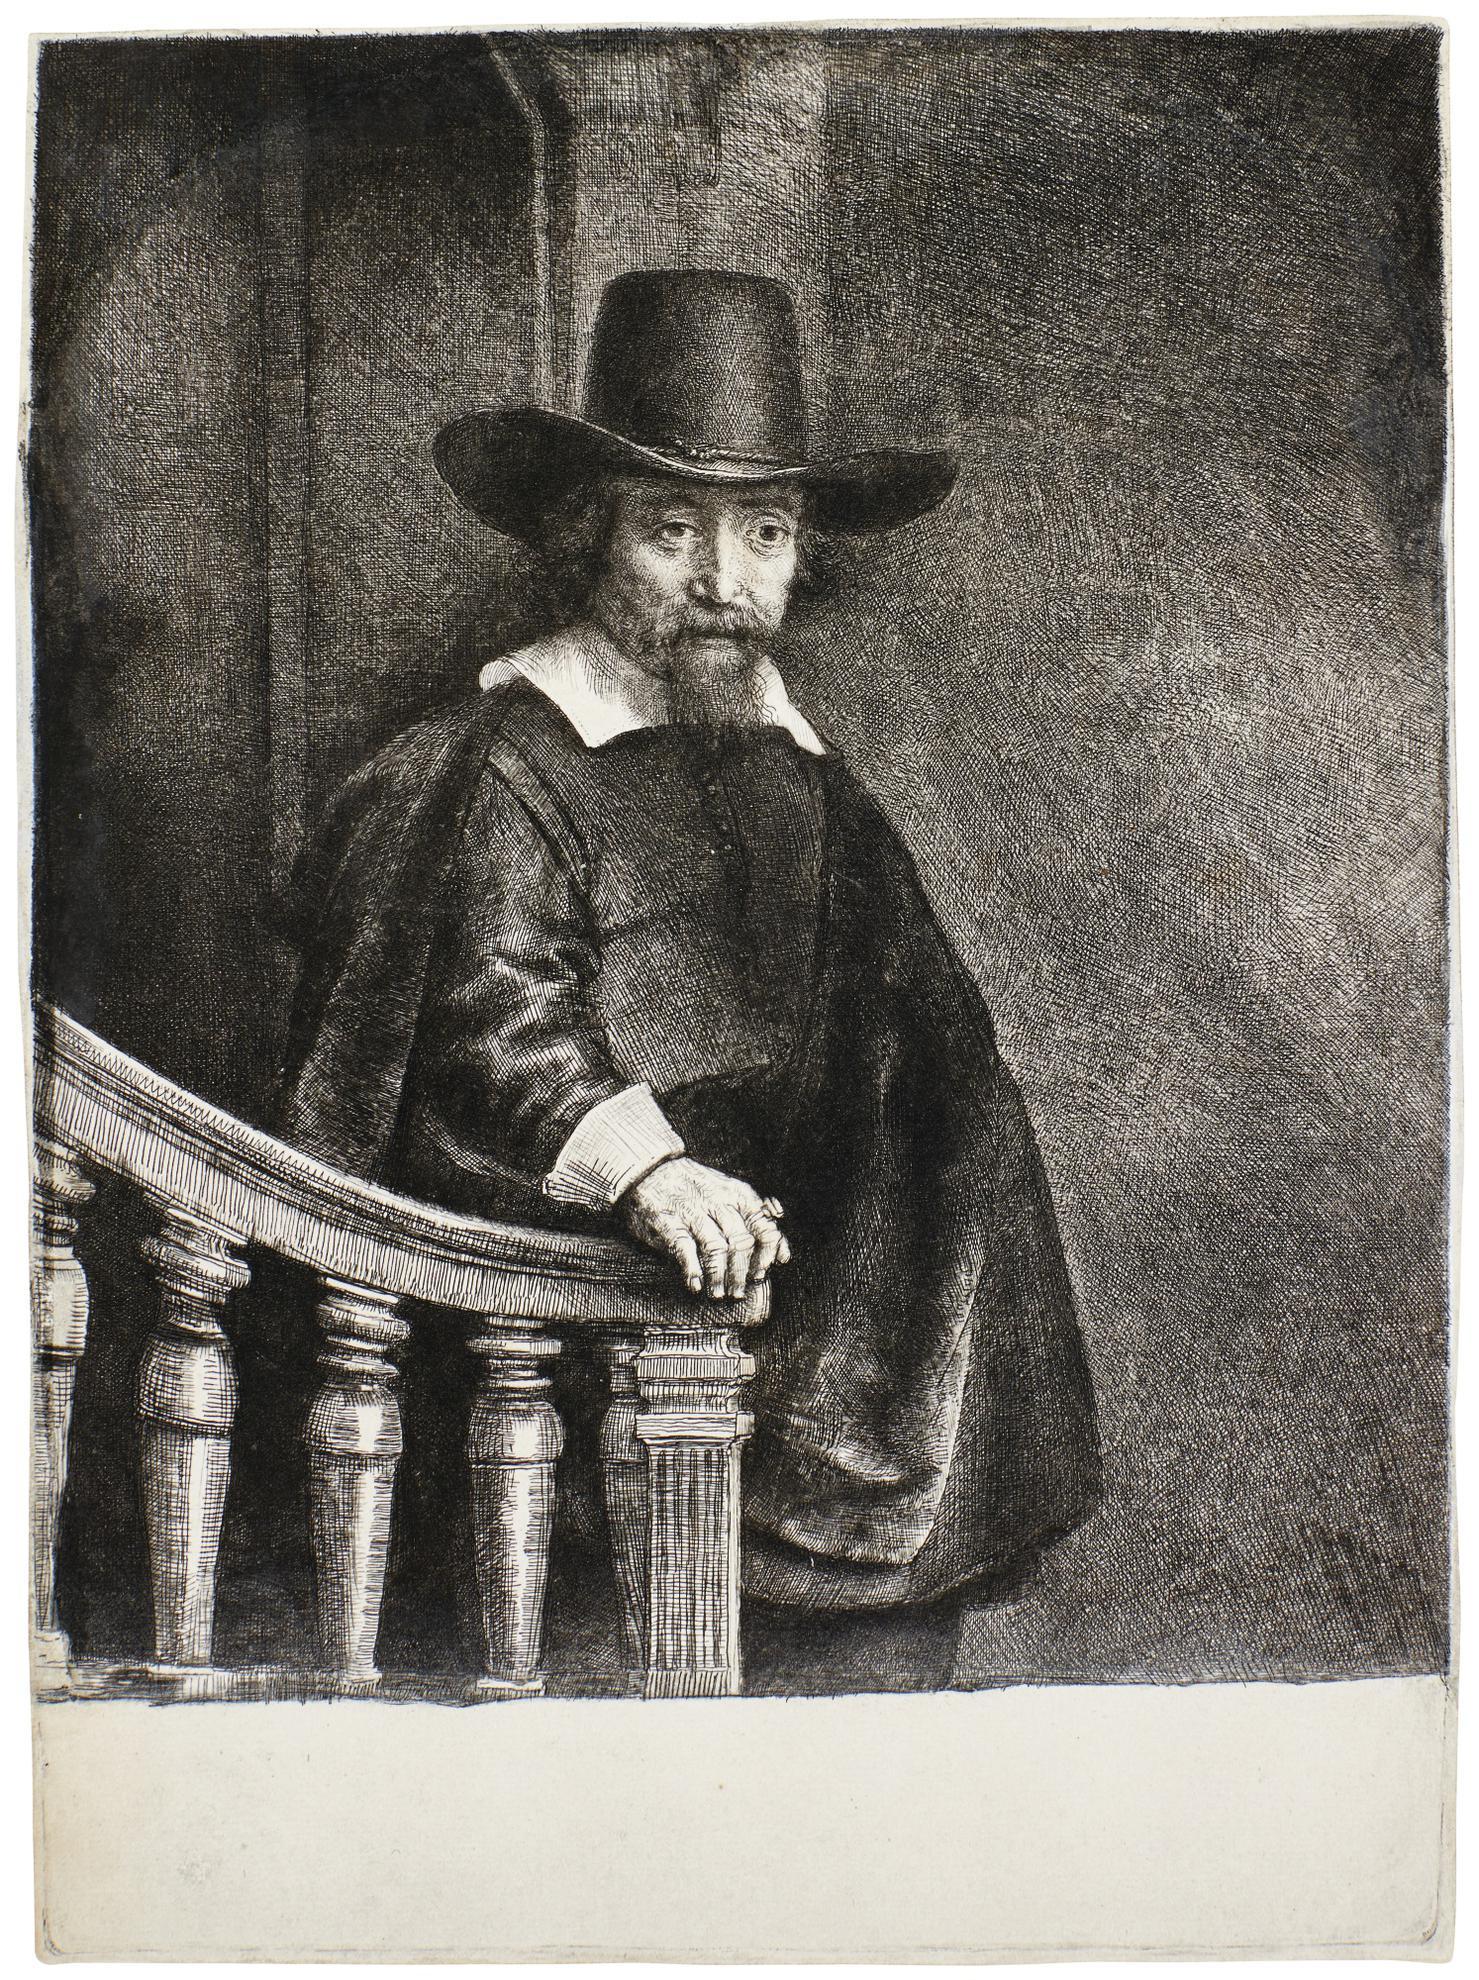 Rembrandt van Rijn-Ephraim Bonus, Jewish Physician (B., Holl. 278; New Holl. 237; H. 226)-1647